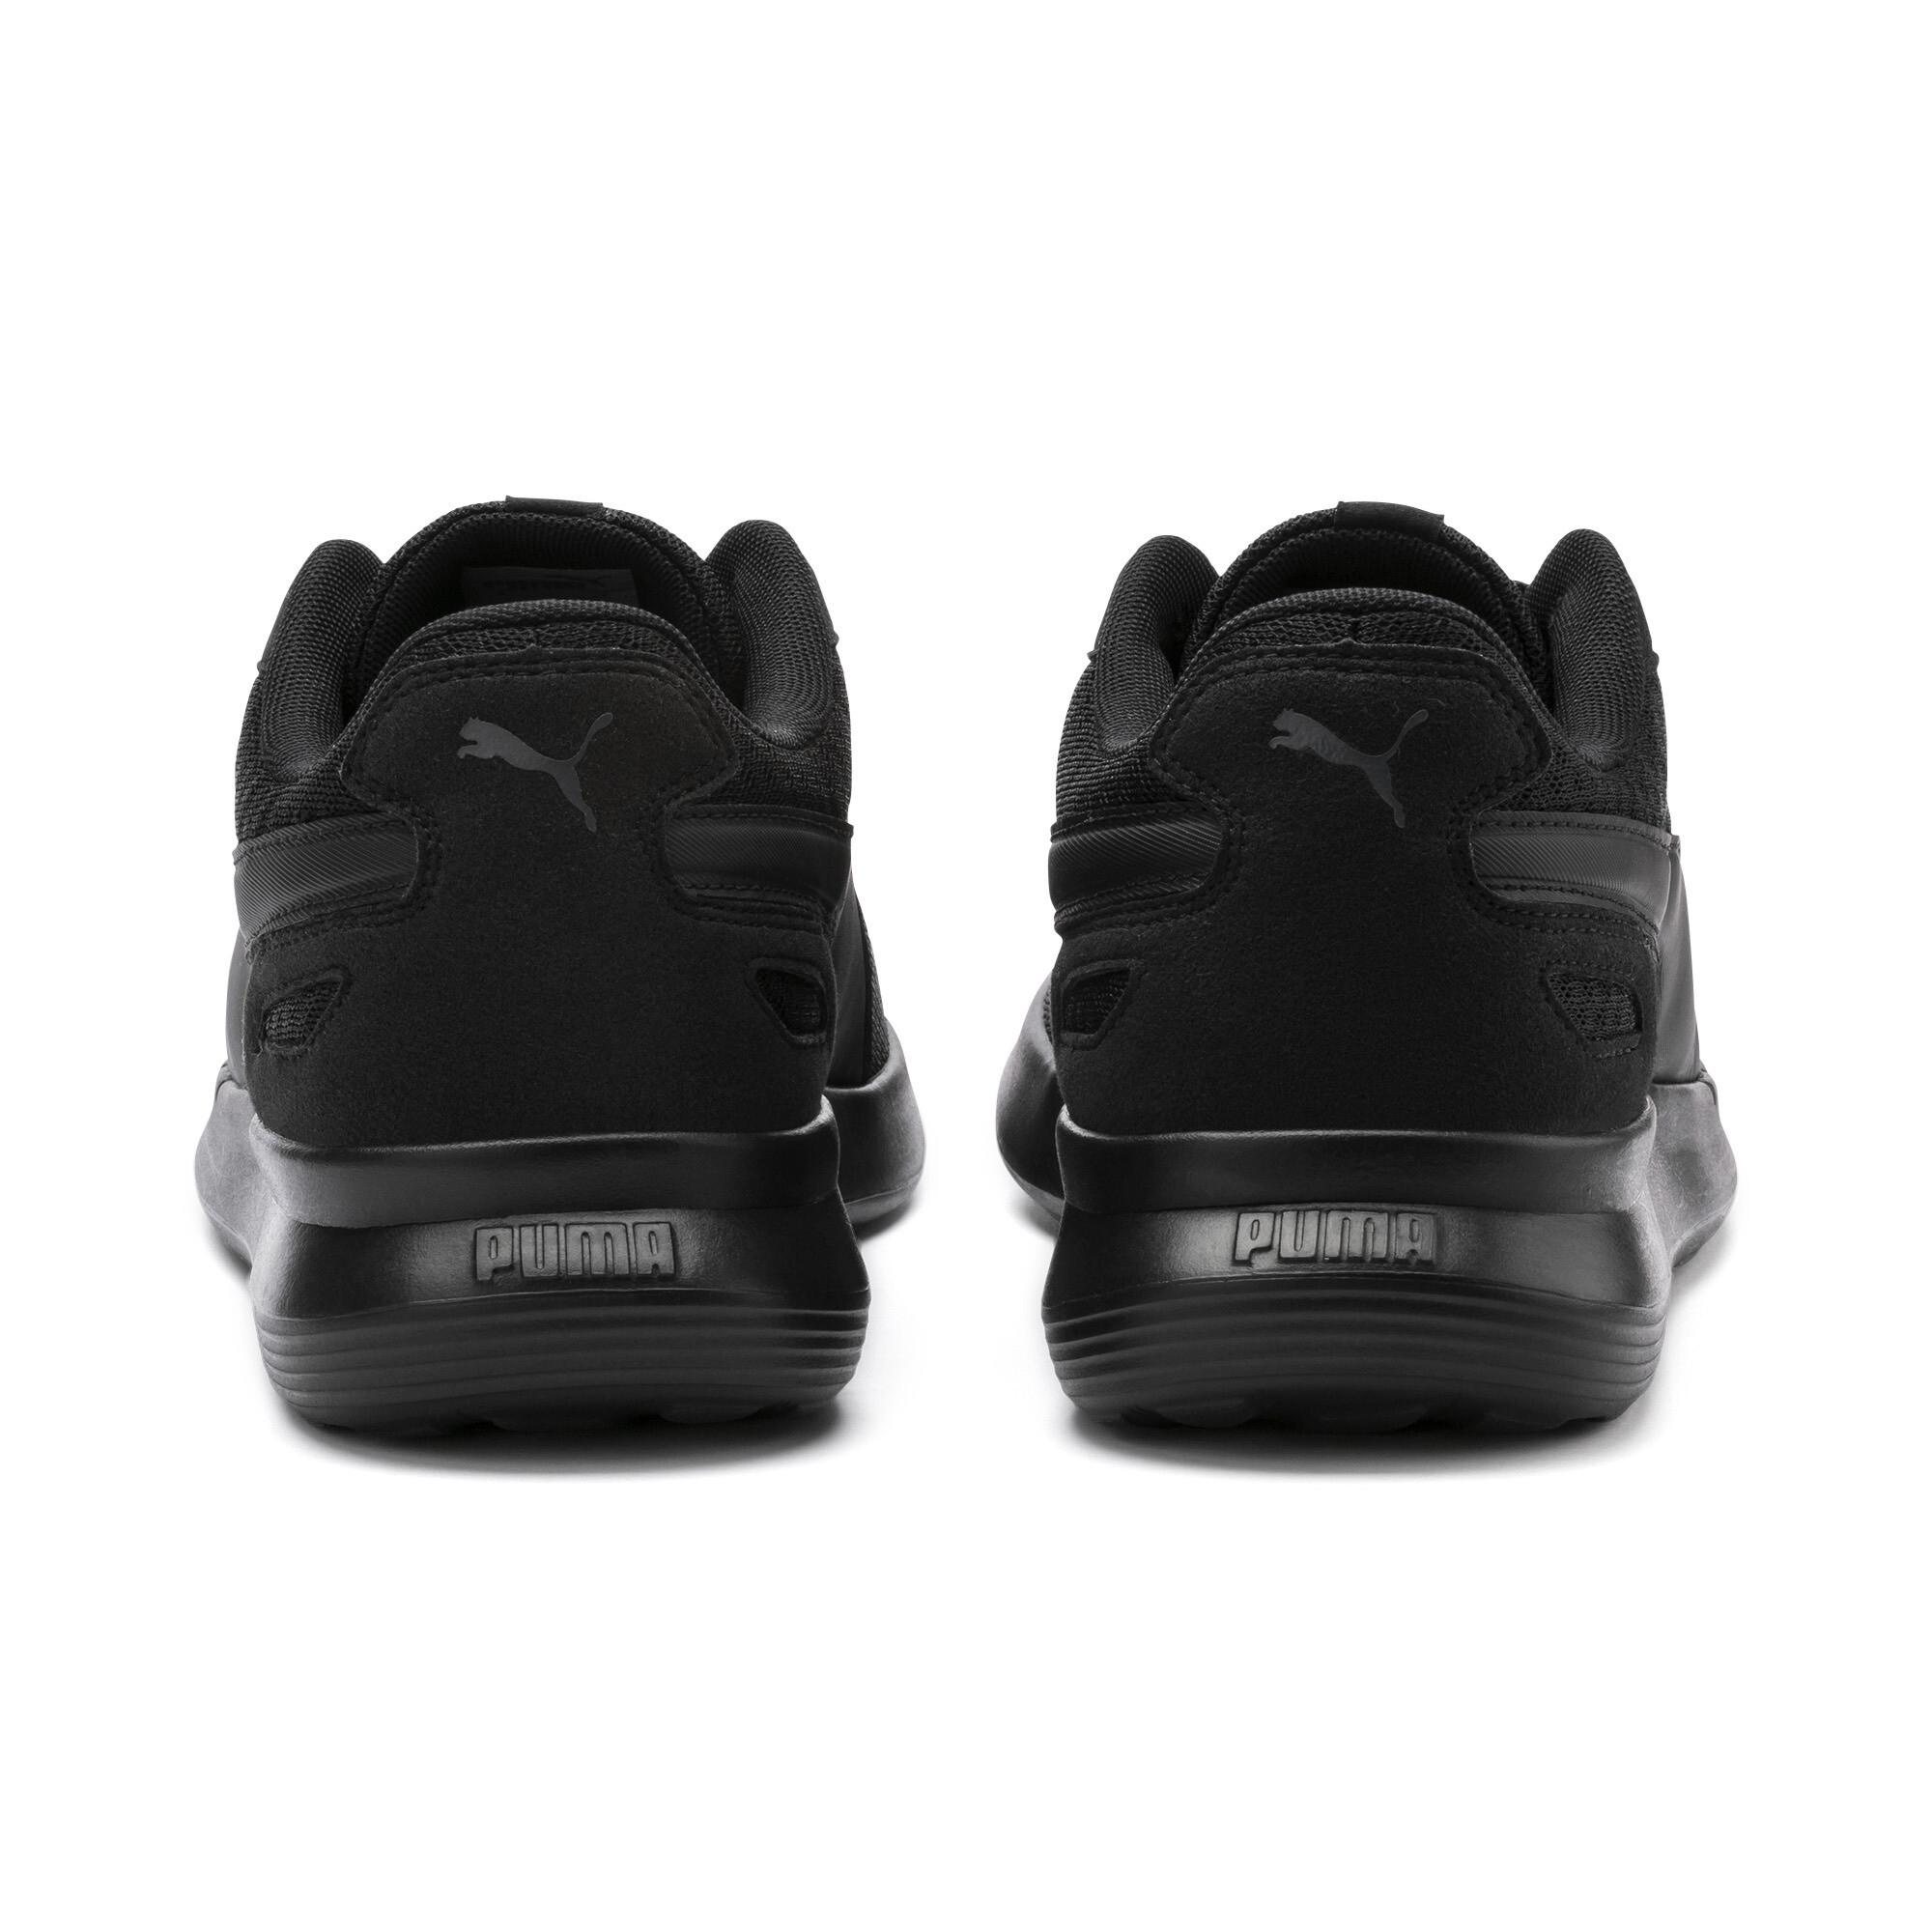 PUMA-Men-039-s-ST-Activate-Sneakers thumbnail 3